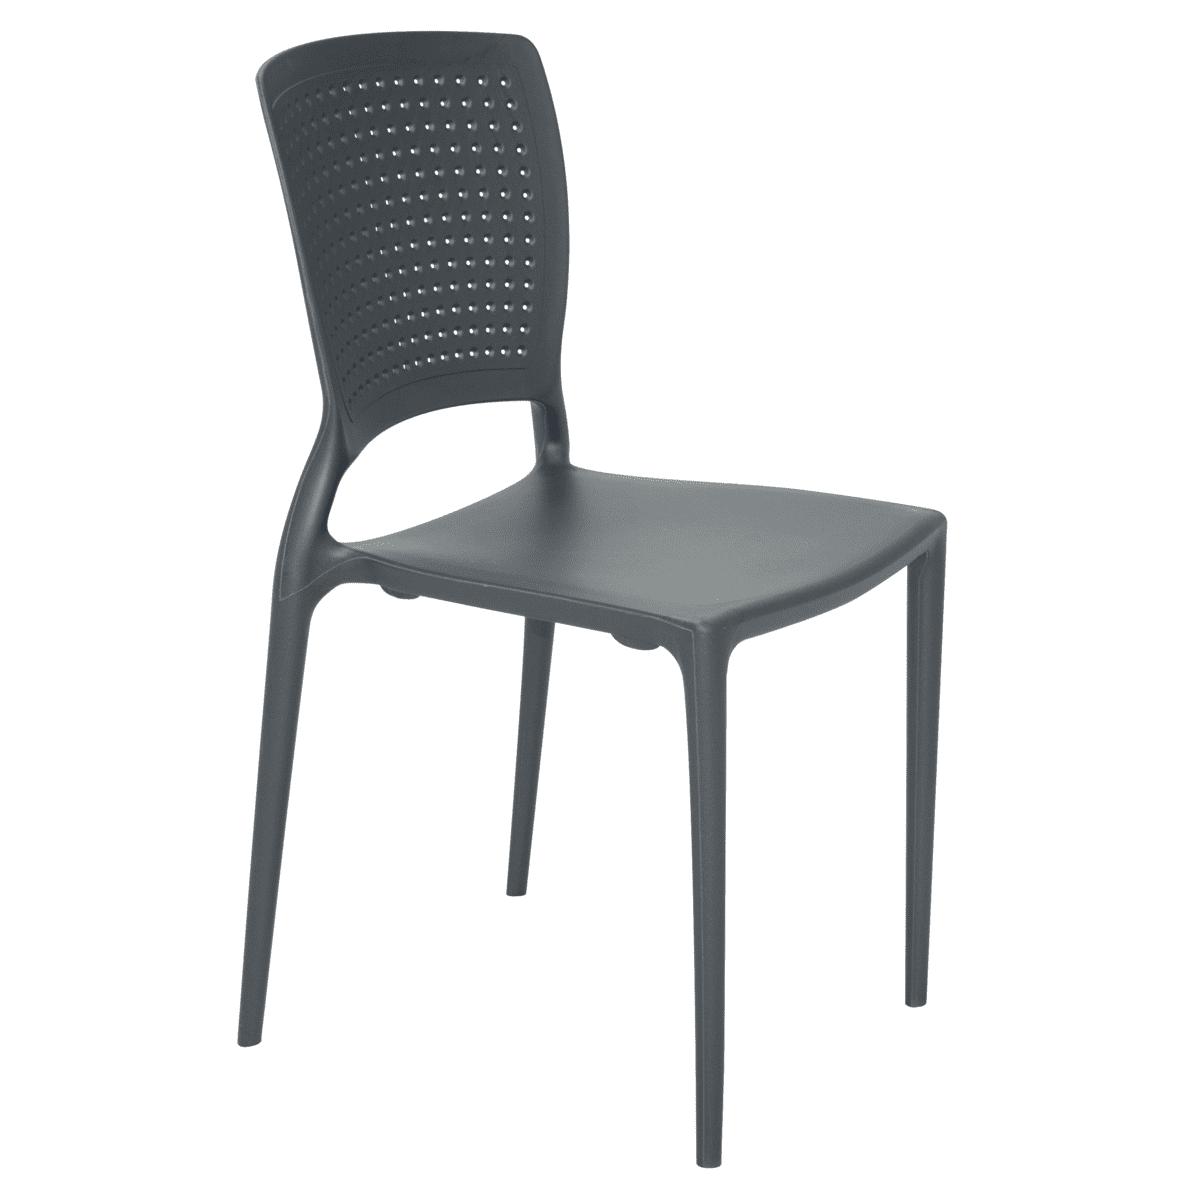 Cadeira Tramontina Safira Summa Grafite 92048/007 1 Peça  - Casa Mattos